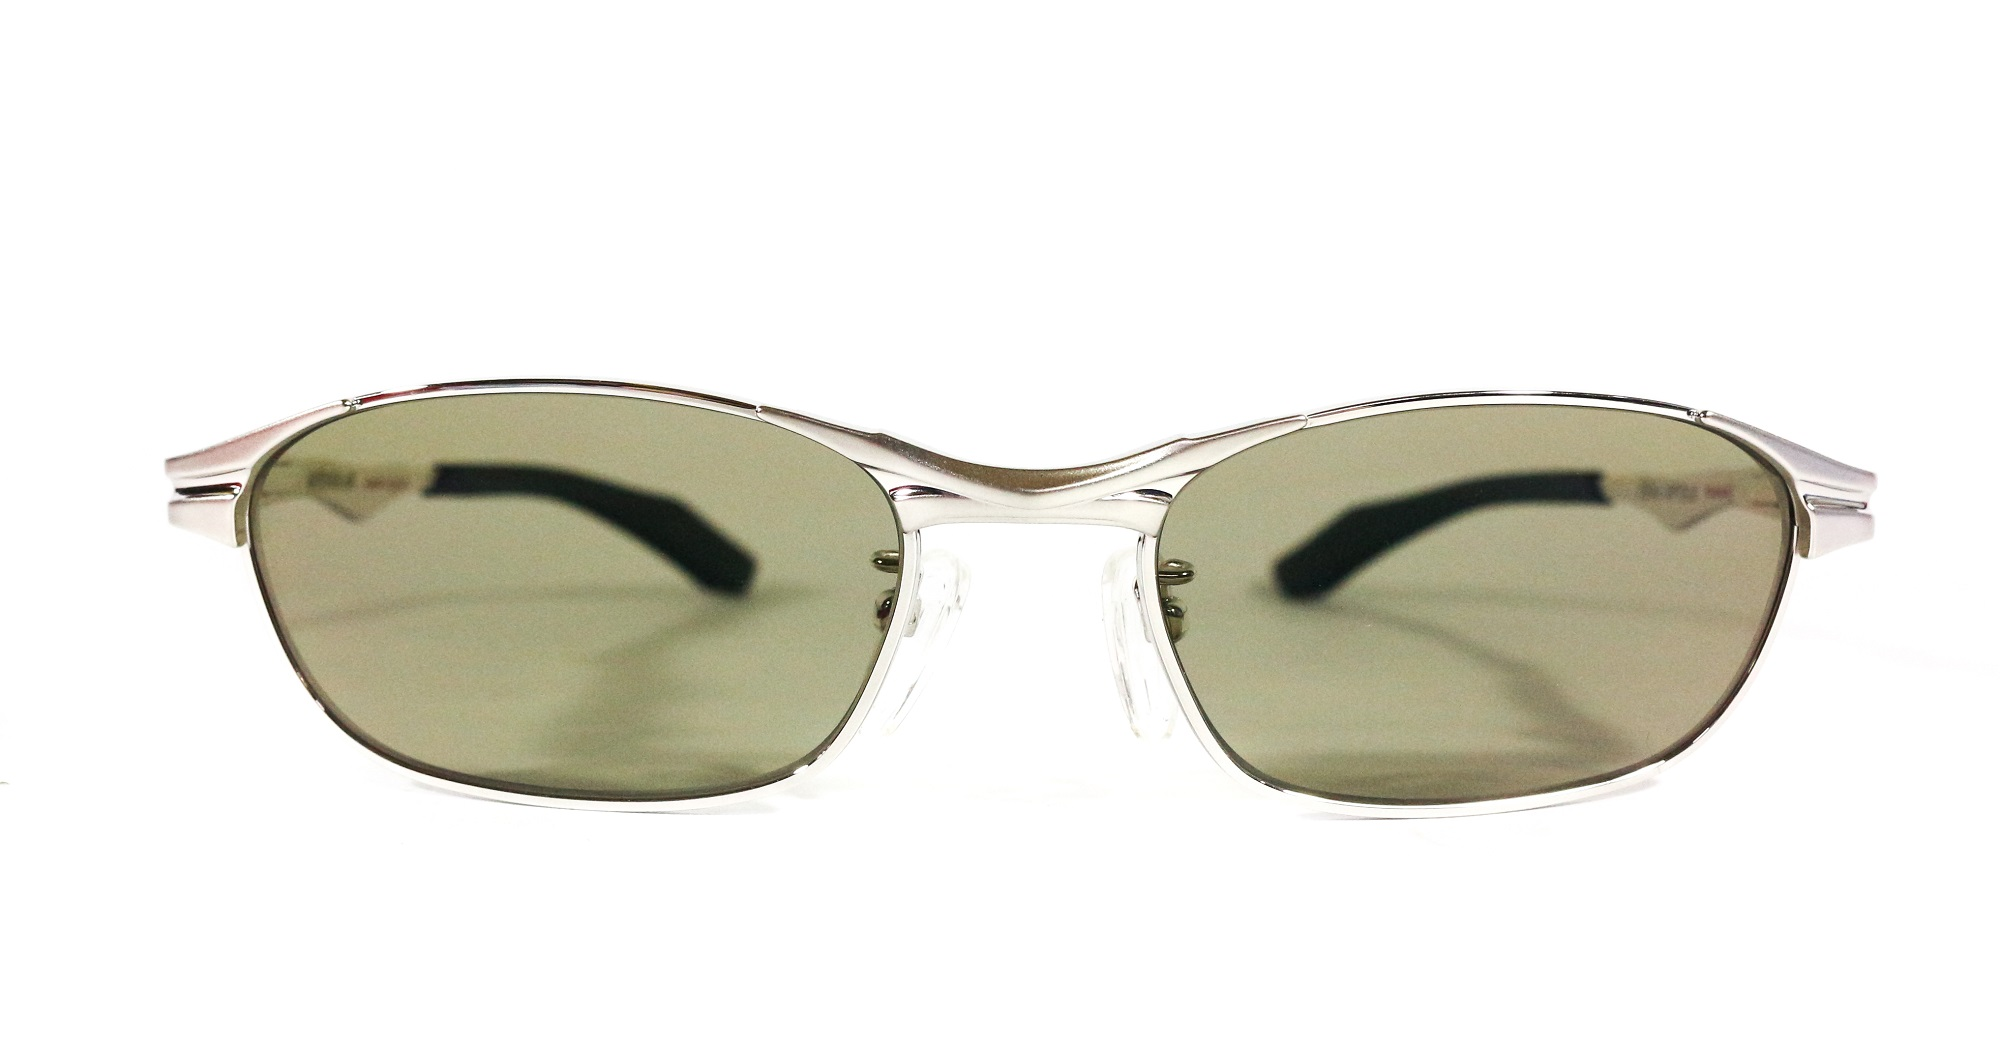 Zeque Polarised Fishing Sunglasses Avenge Elf F-1156 CHRM SILVER TVS (3282)